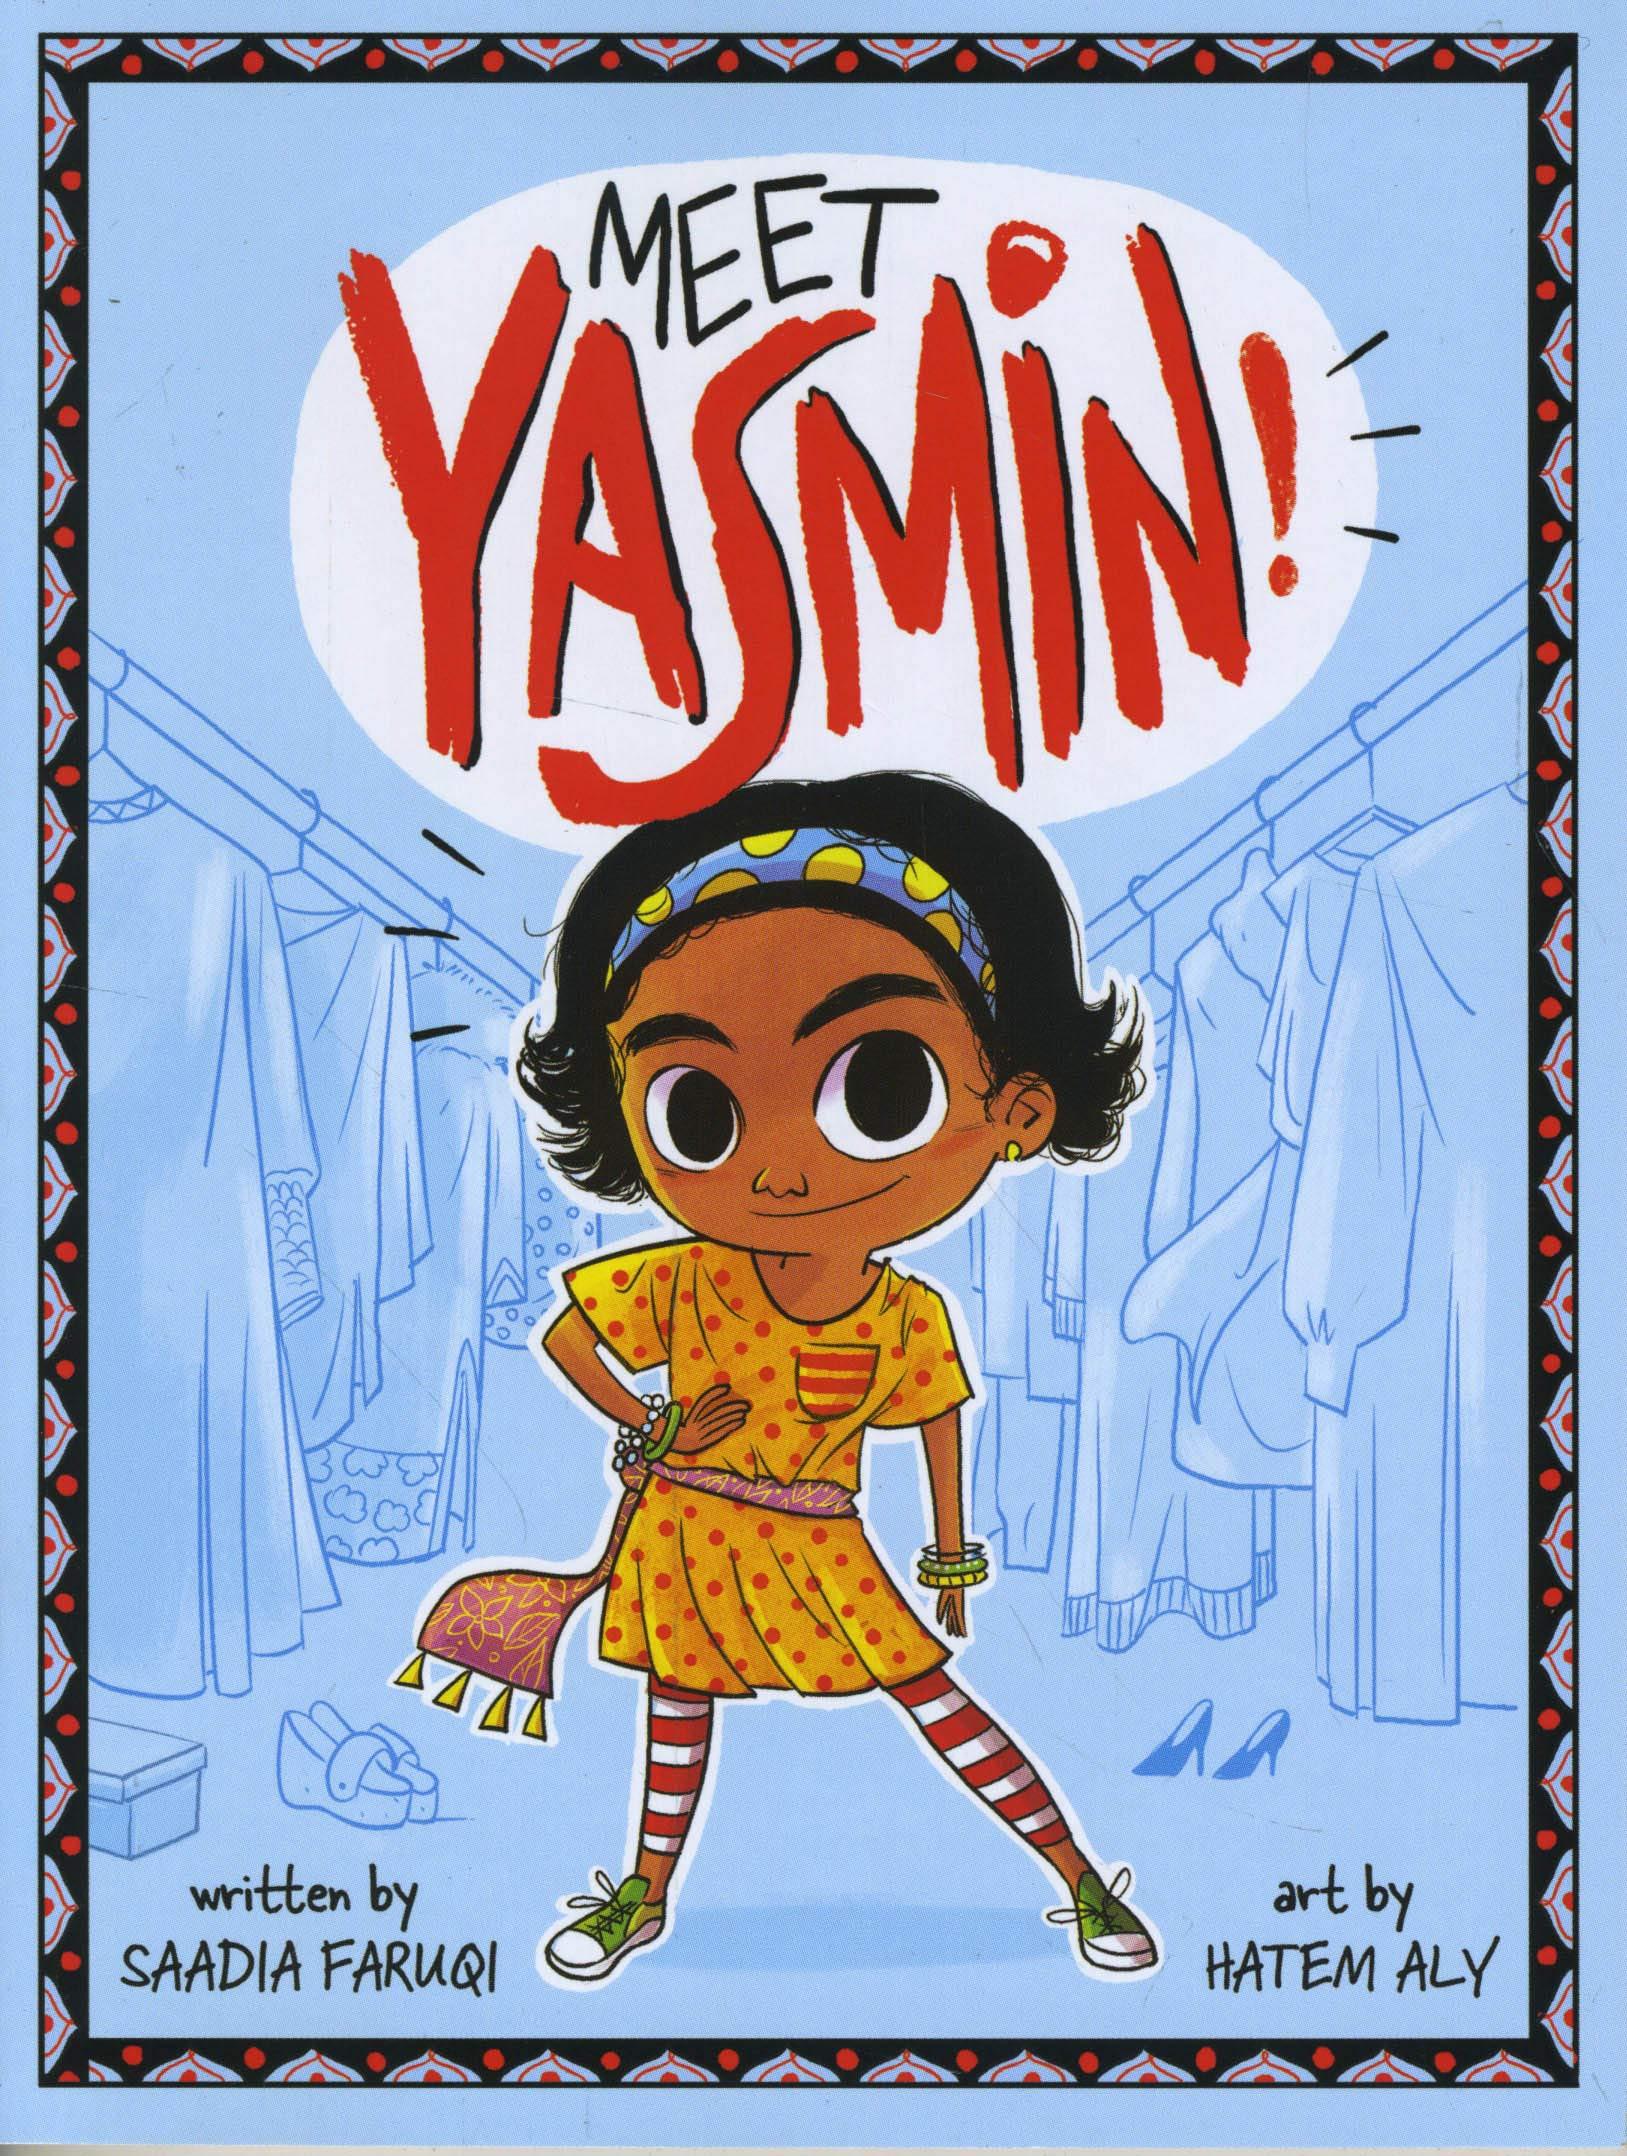 Meet Yasmin!: Faruqi, Saadia, Aly, Hatem: 9781684360222: Amazon.com: Books